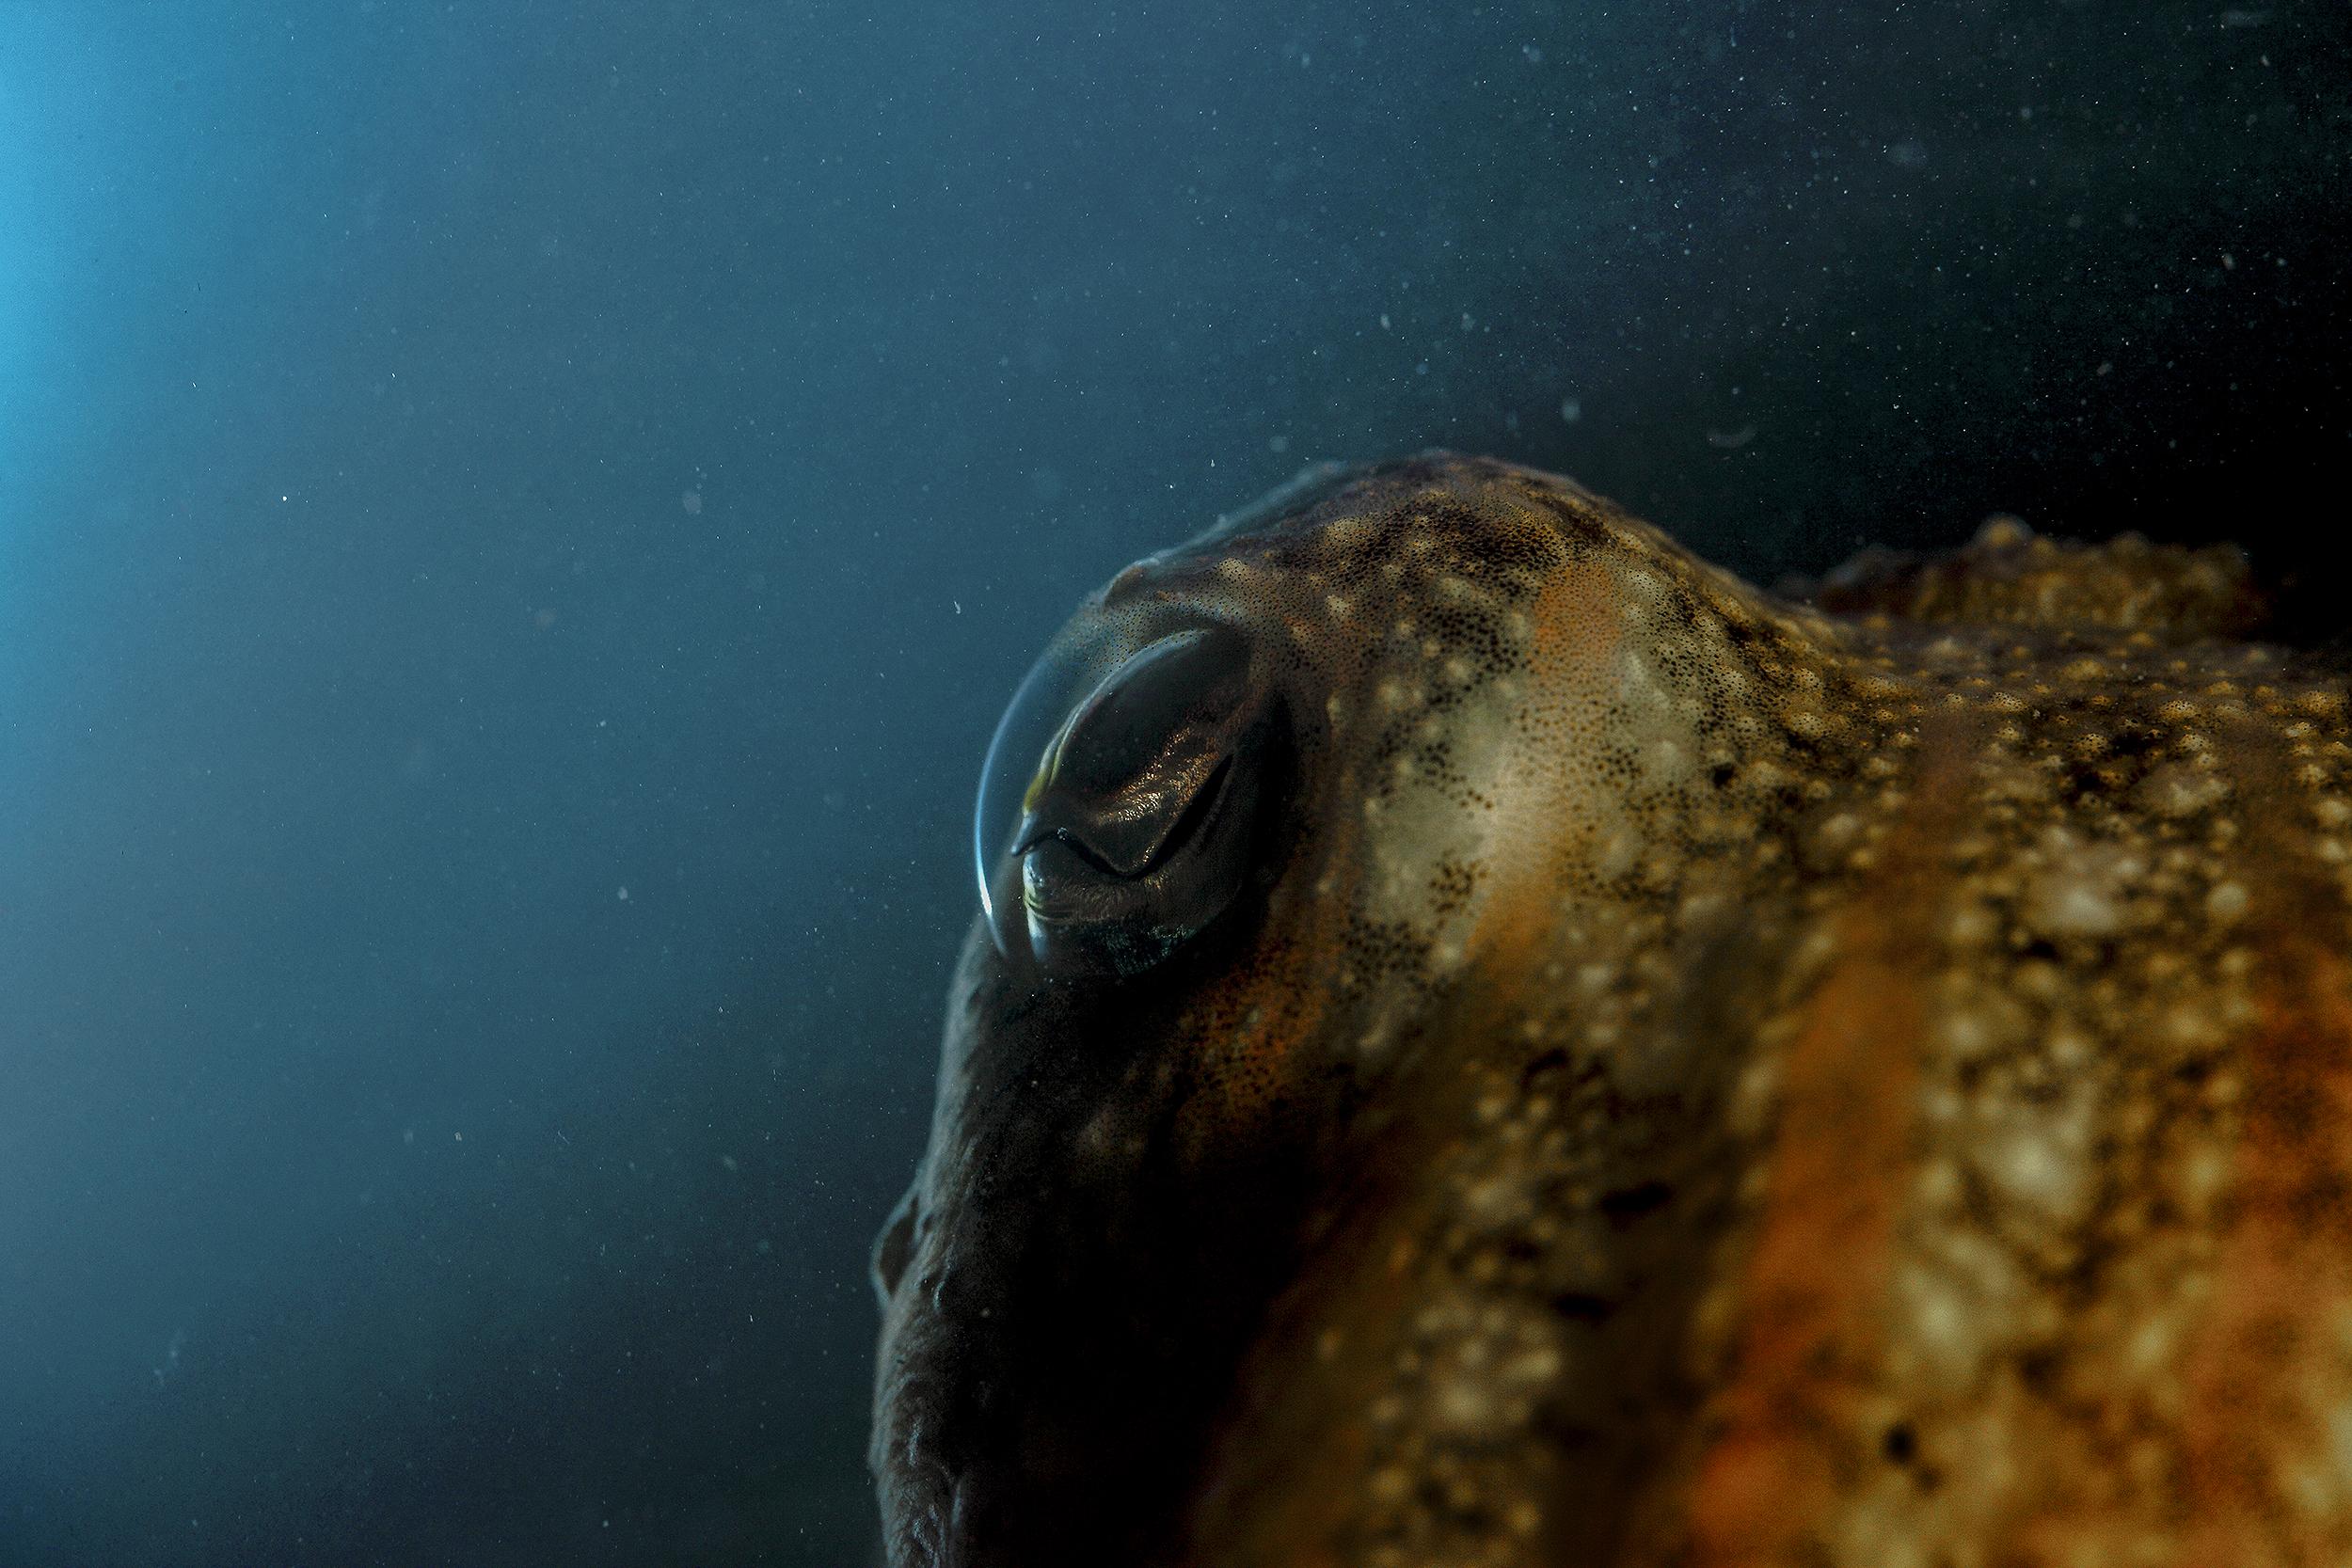 mediterranean_cuttlefish_eye_national_geographic_photo_by_flavio_oliva